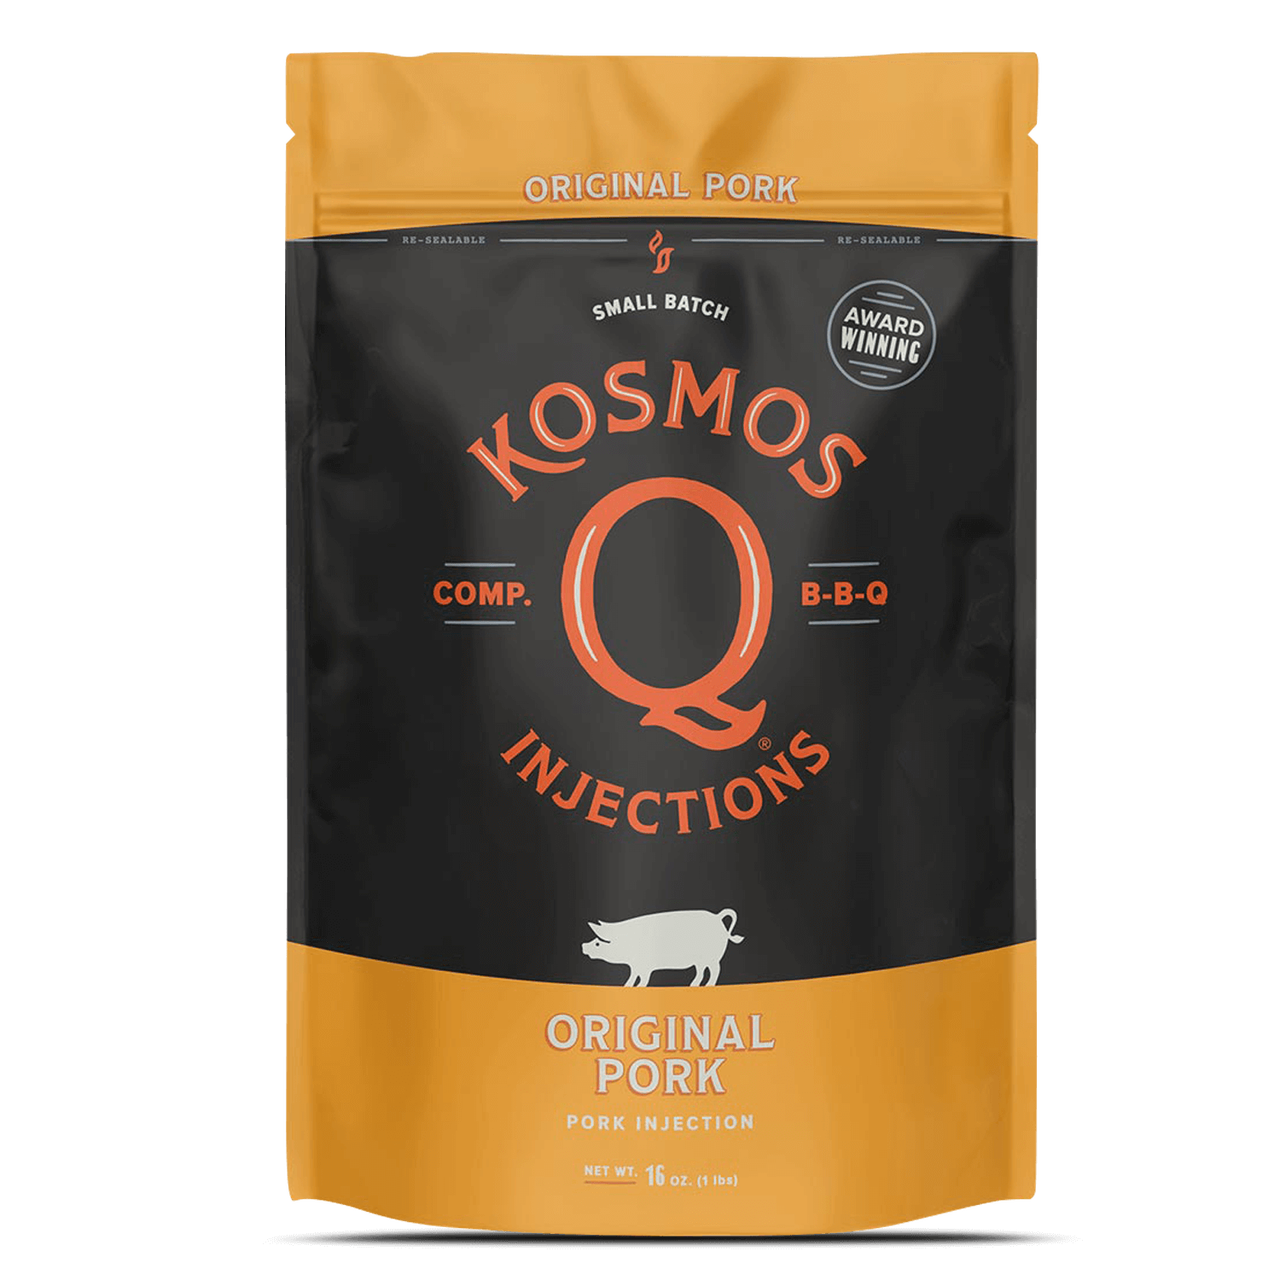 Kosmo´s Q Original Pork Injection 453 g